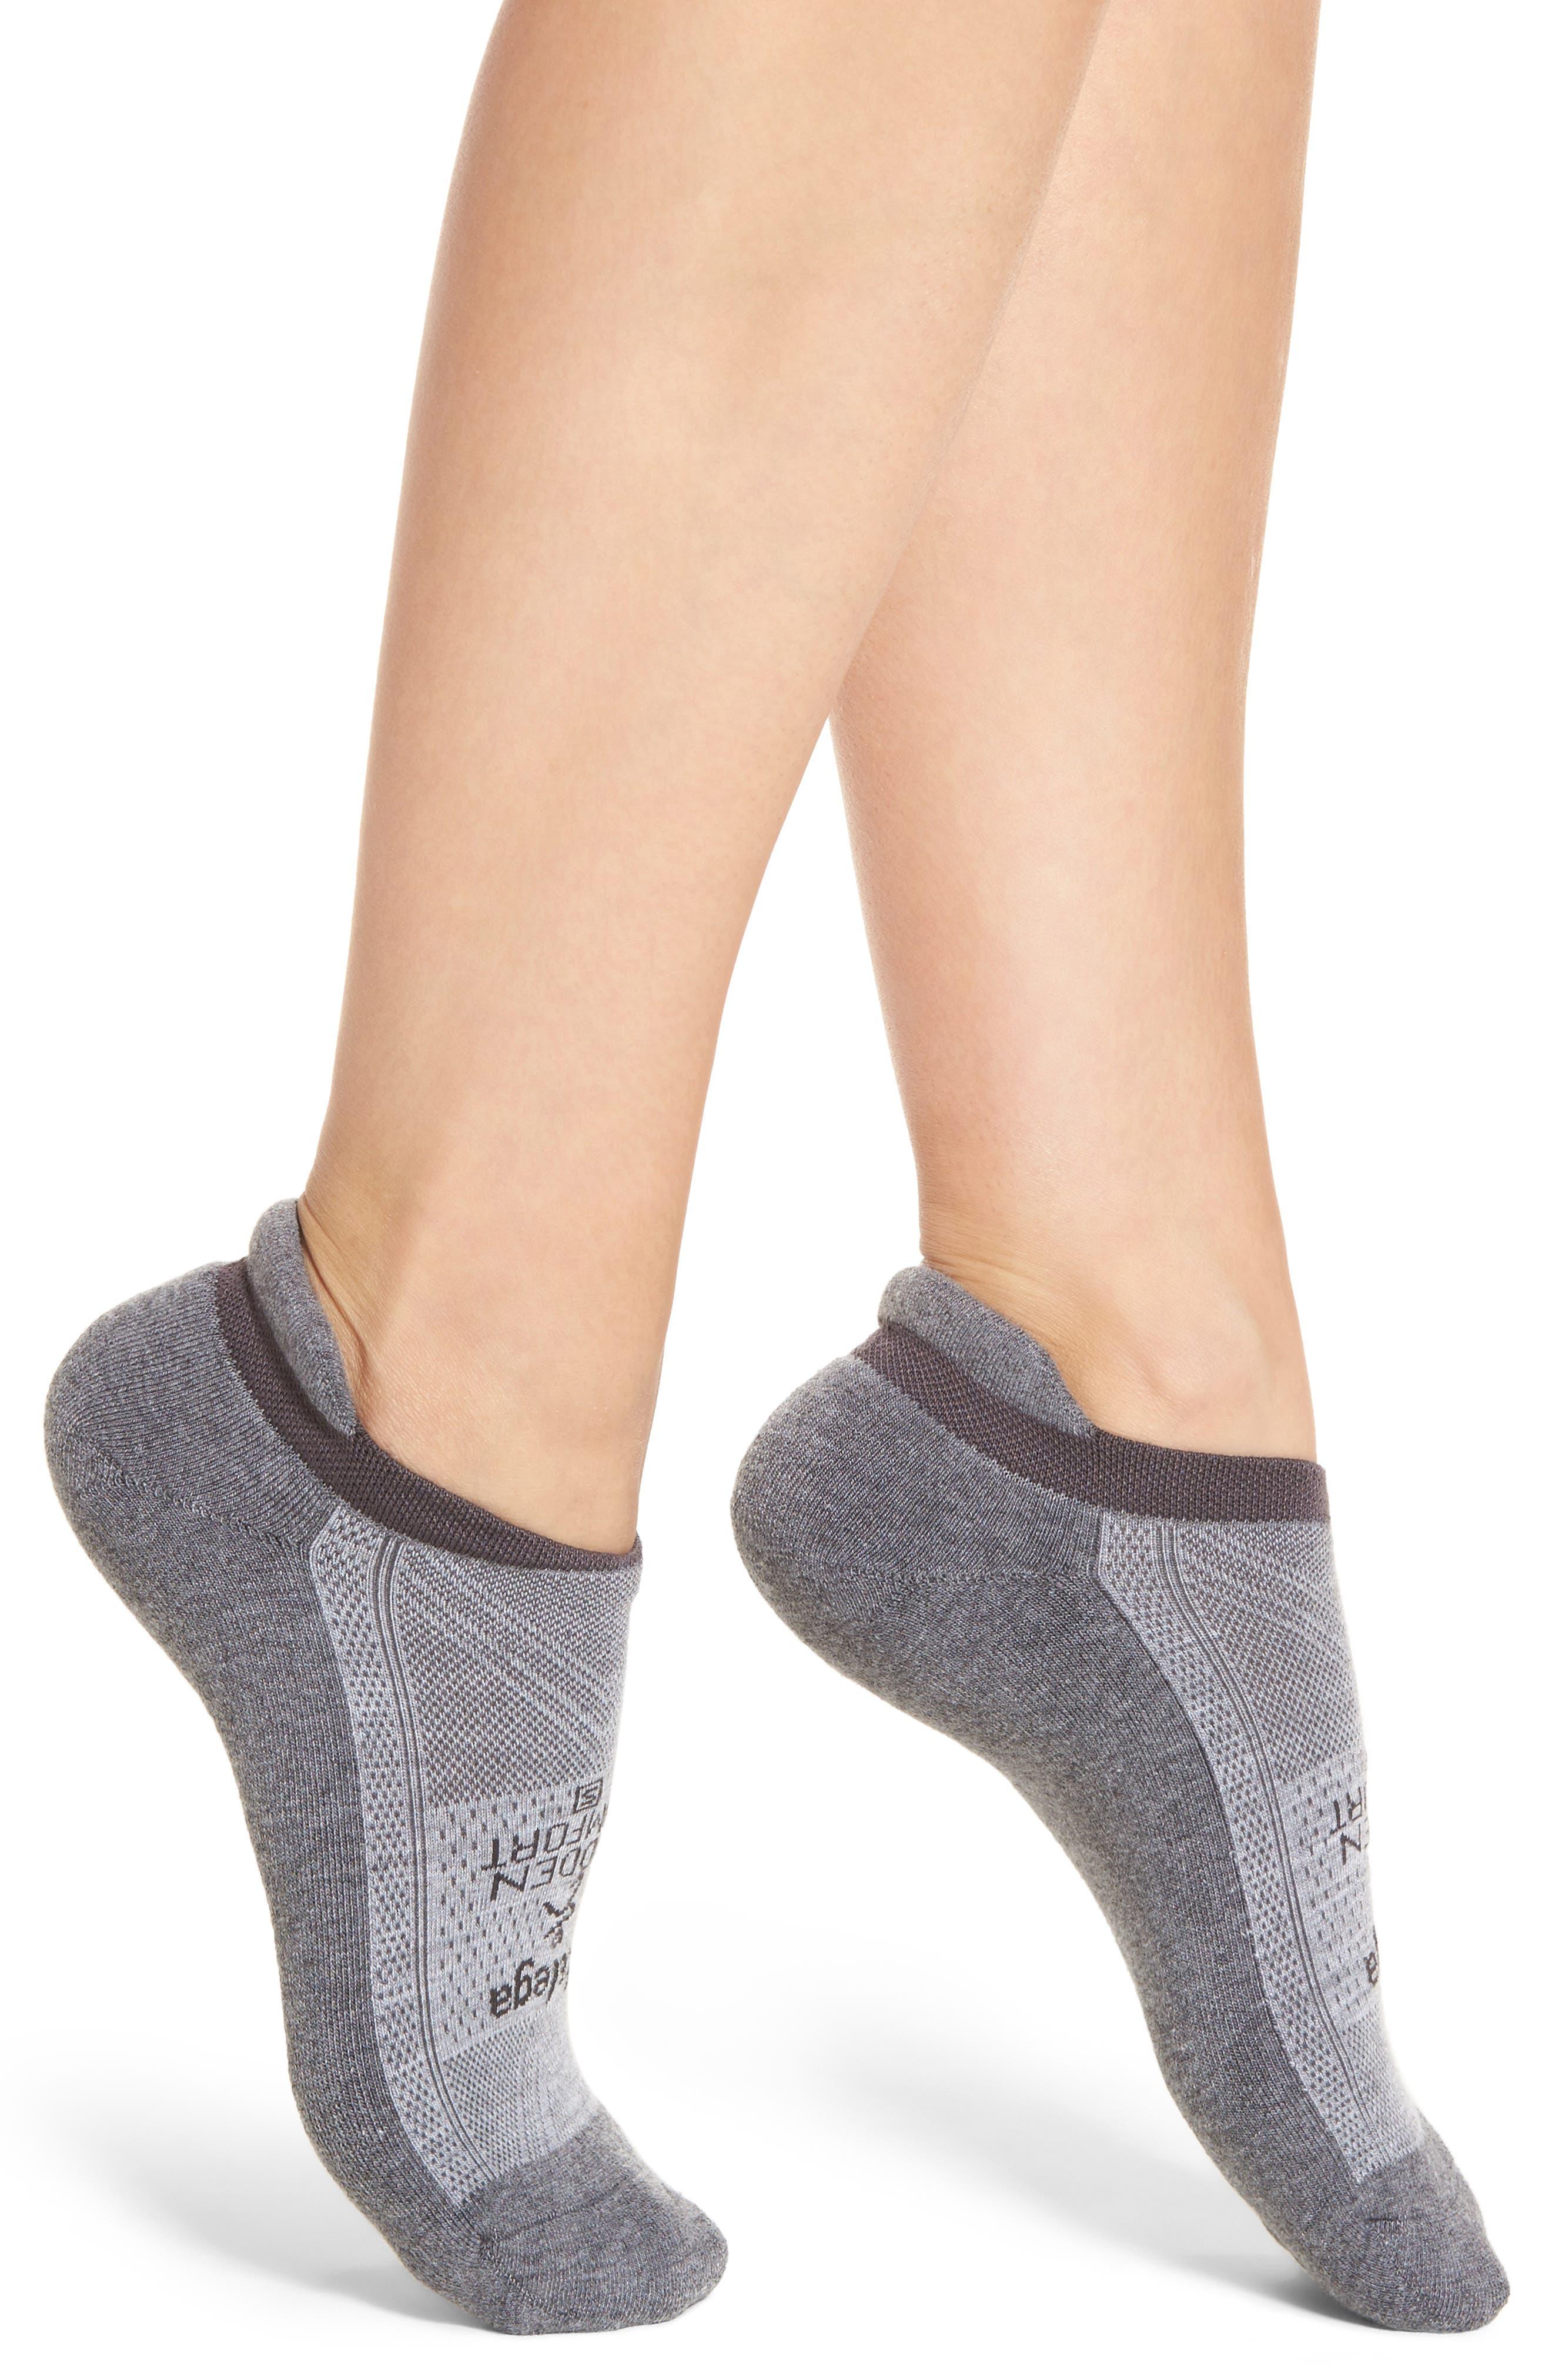 Hidden Comfort No-Show Running Socks,                             Main thumbnail 1, color,                             021